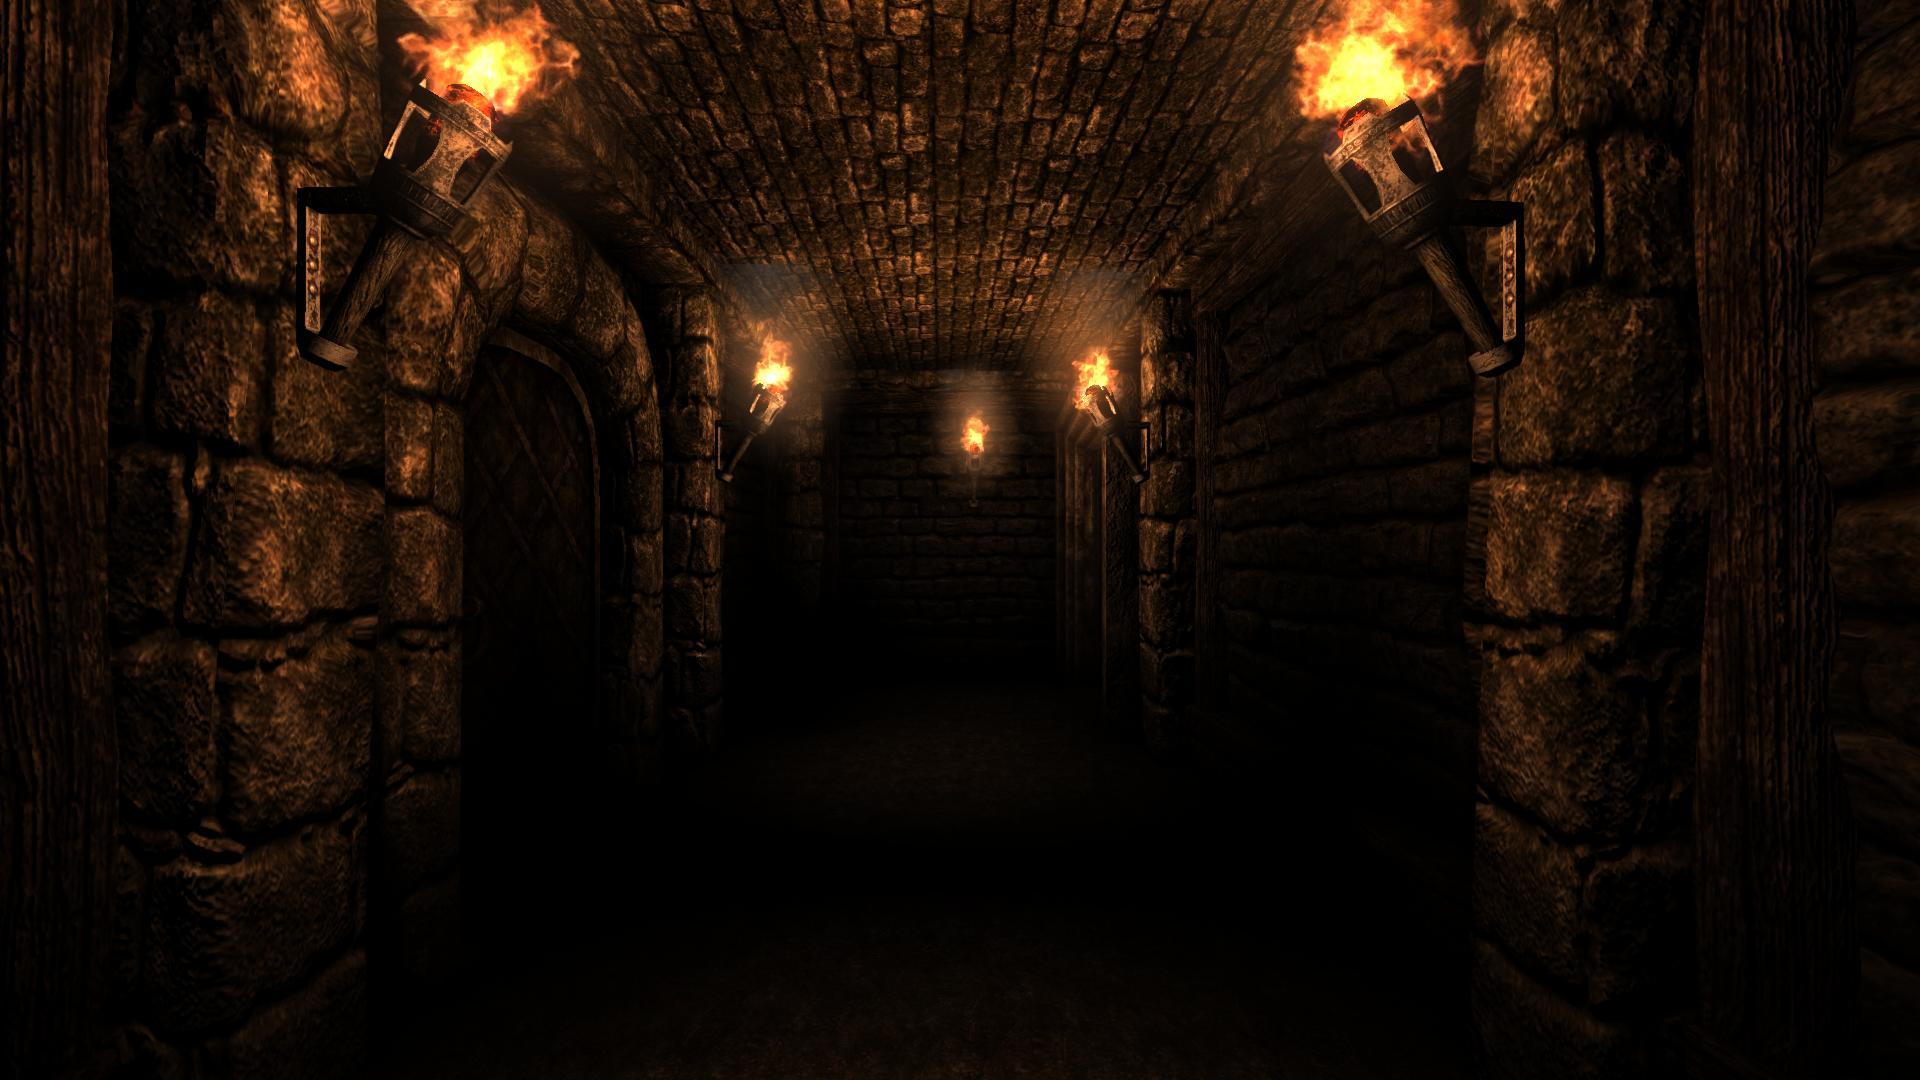 Underground Sewer Cellars Image A Coma Awakening The